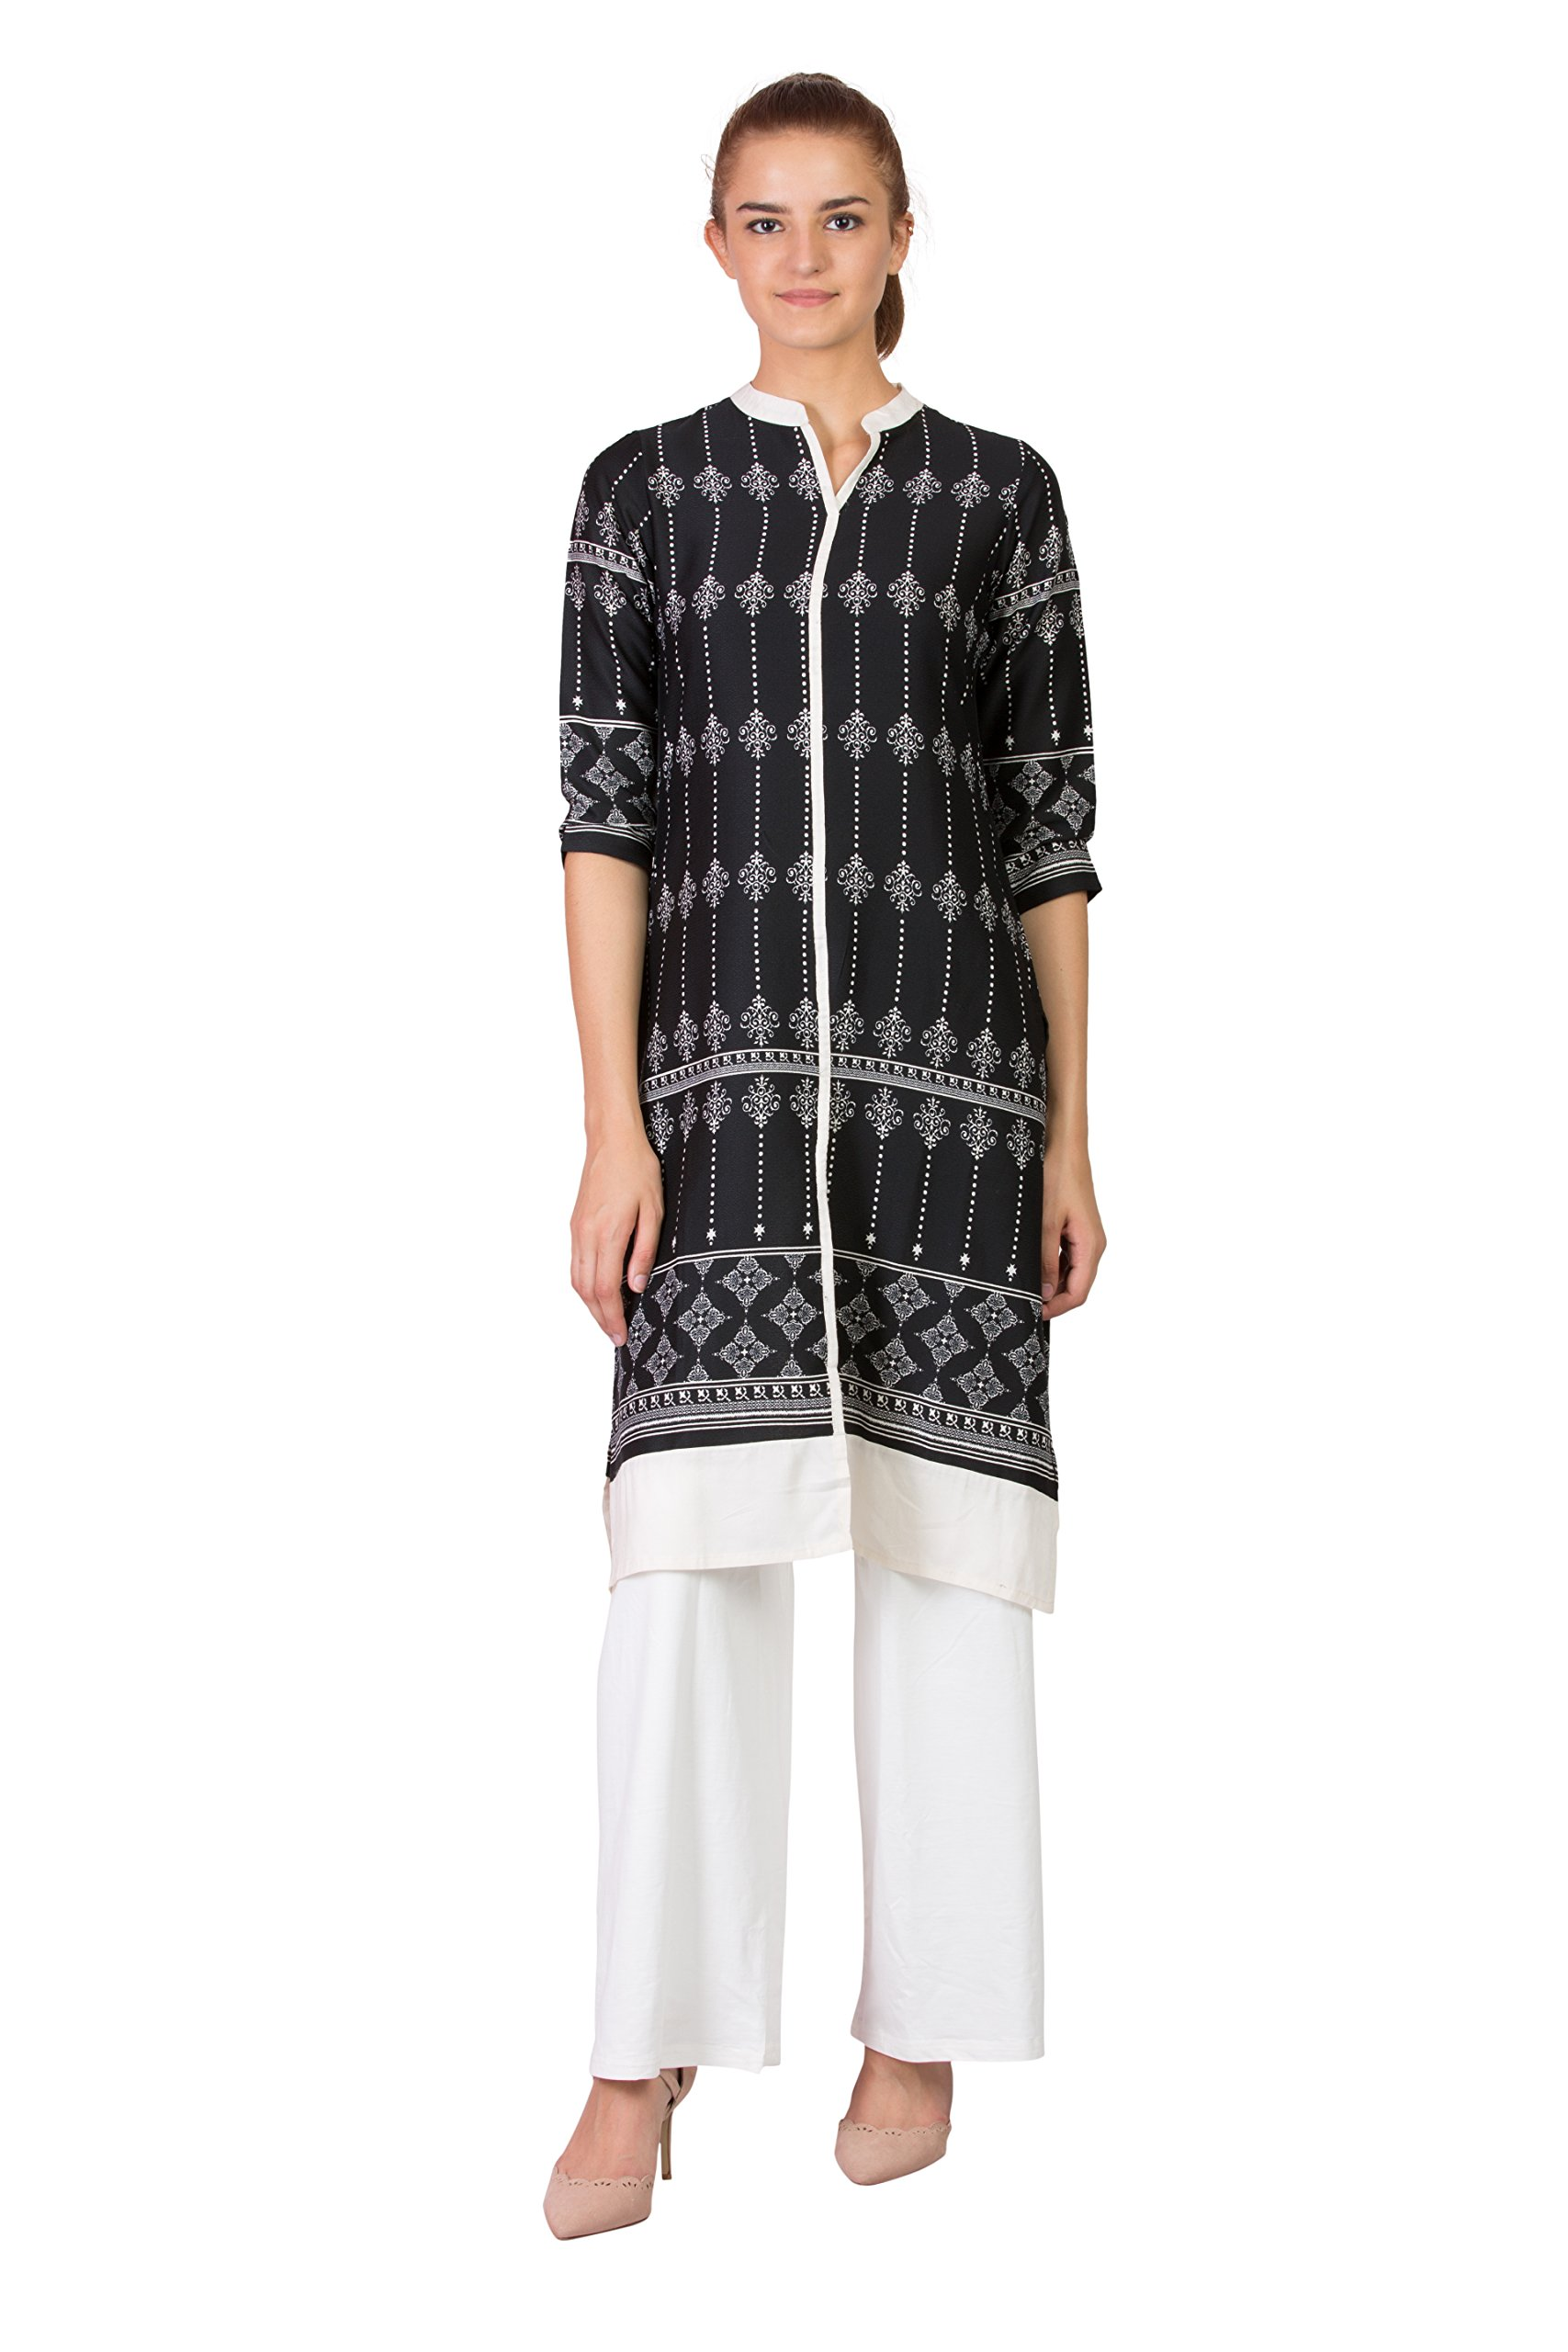 SABHYATA Women's Material:100% Pure Artifical Silk Neck Type:Chinese Neck Large/42 Black